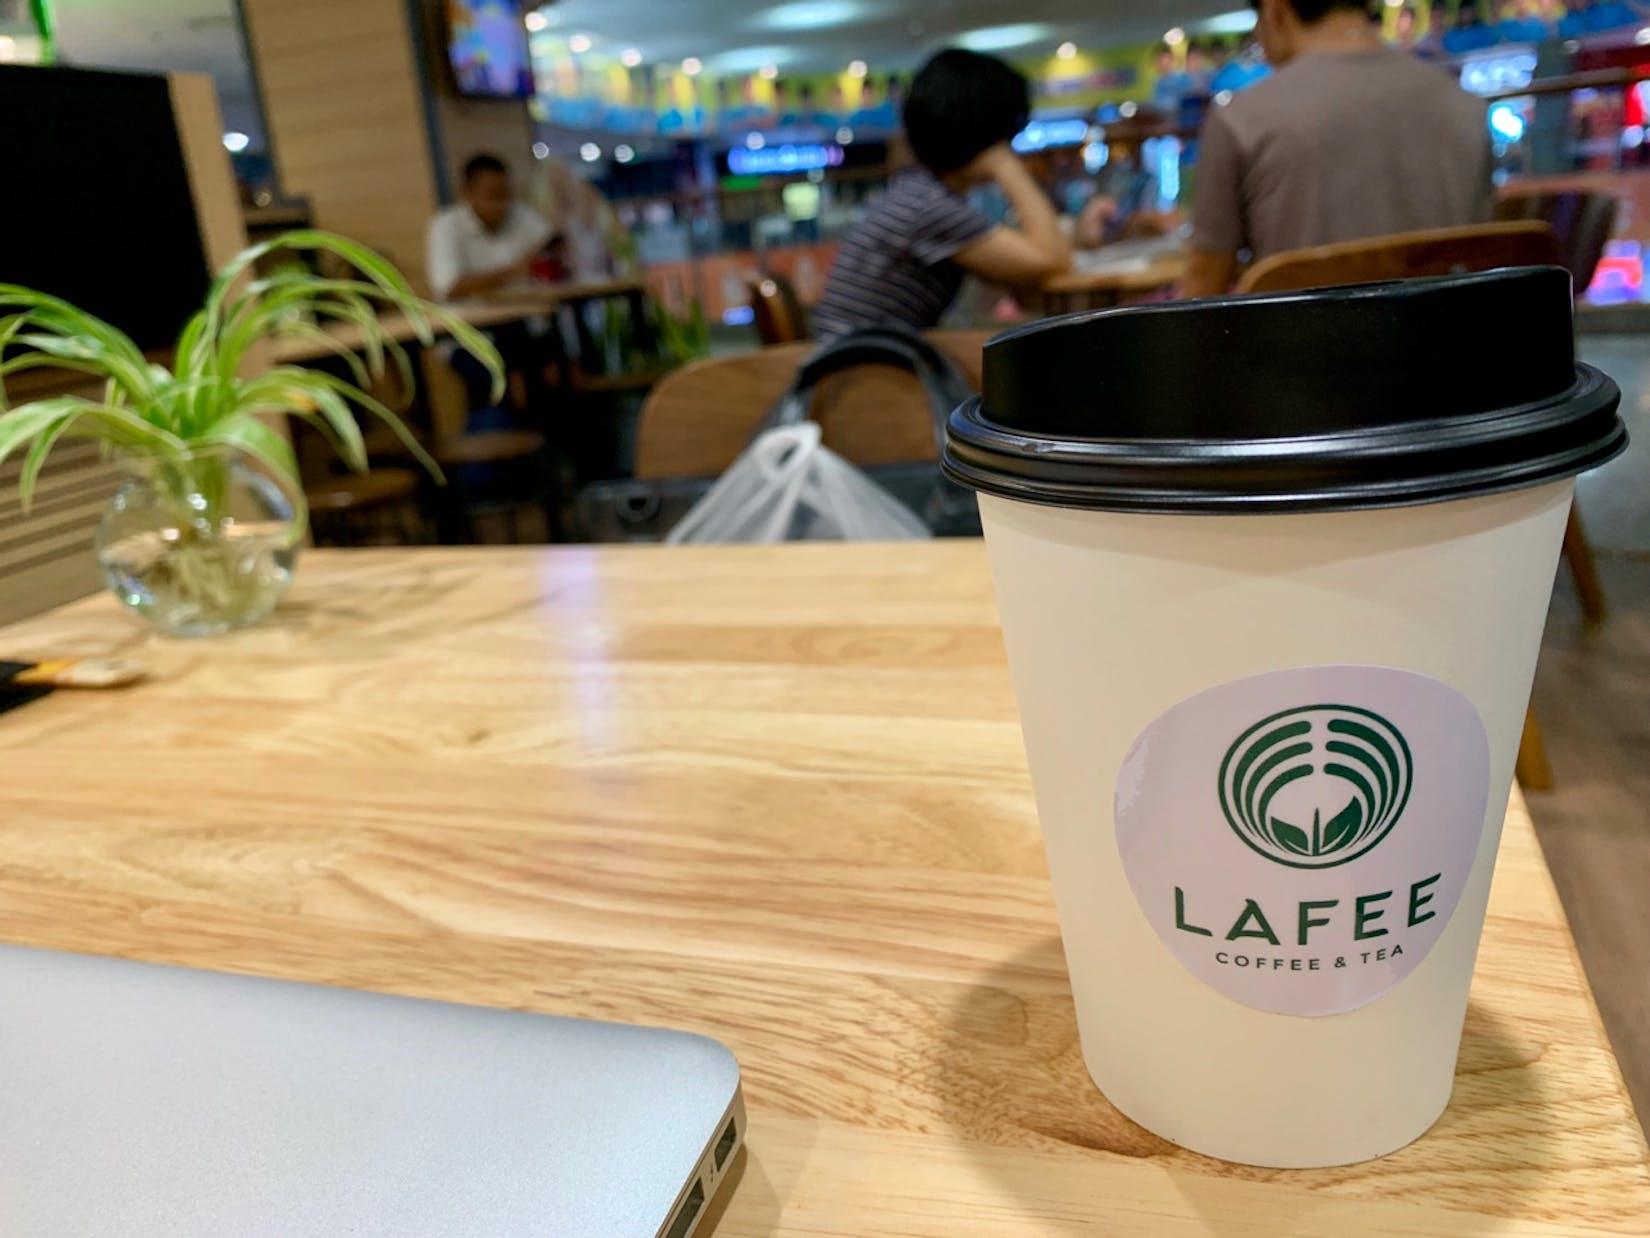 Lafee Coffee & Tea | yathar